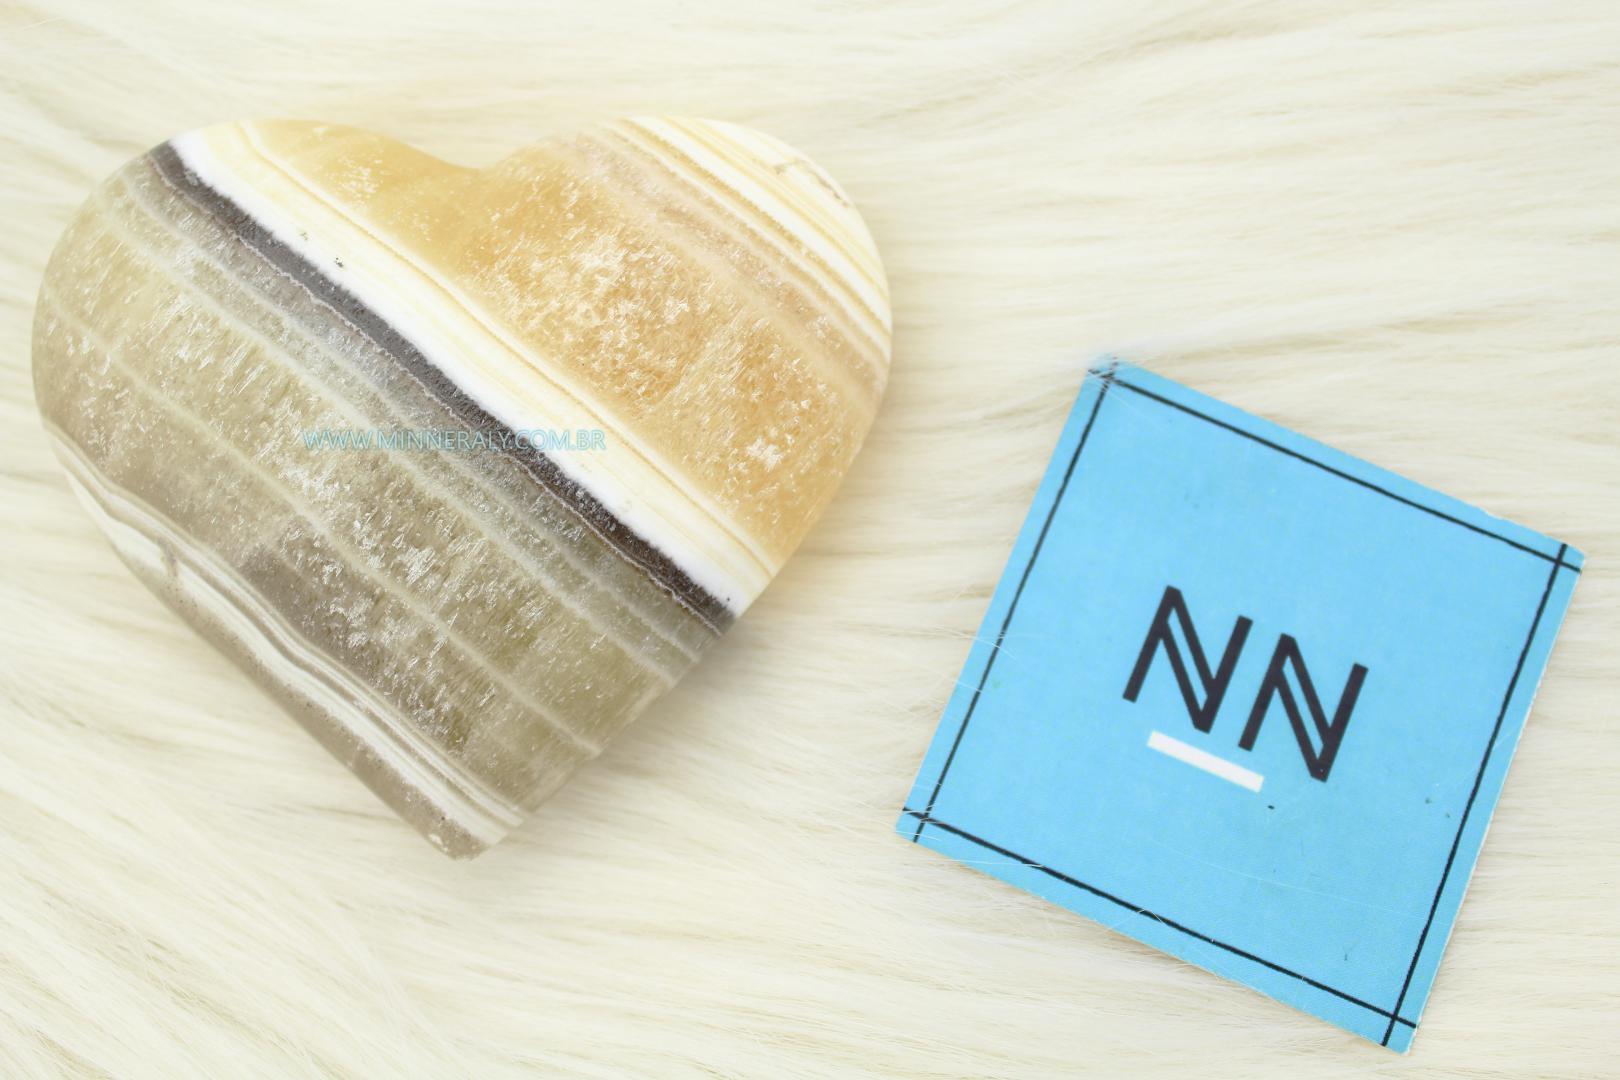 Coração de Ônix Aragonita in Natura  (0,210kg; 2,7cm) #NN118